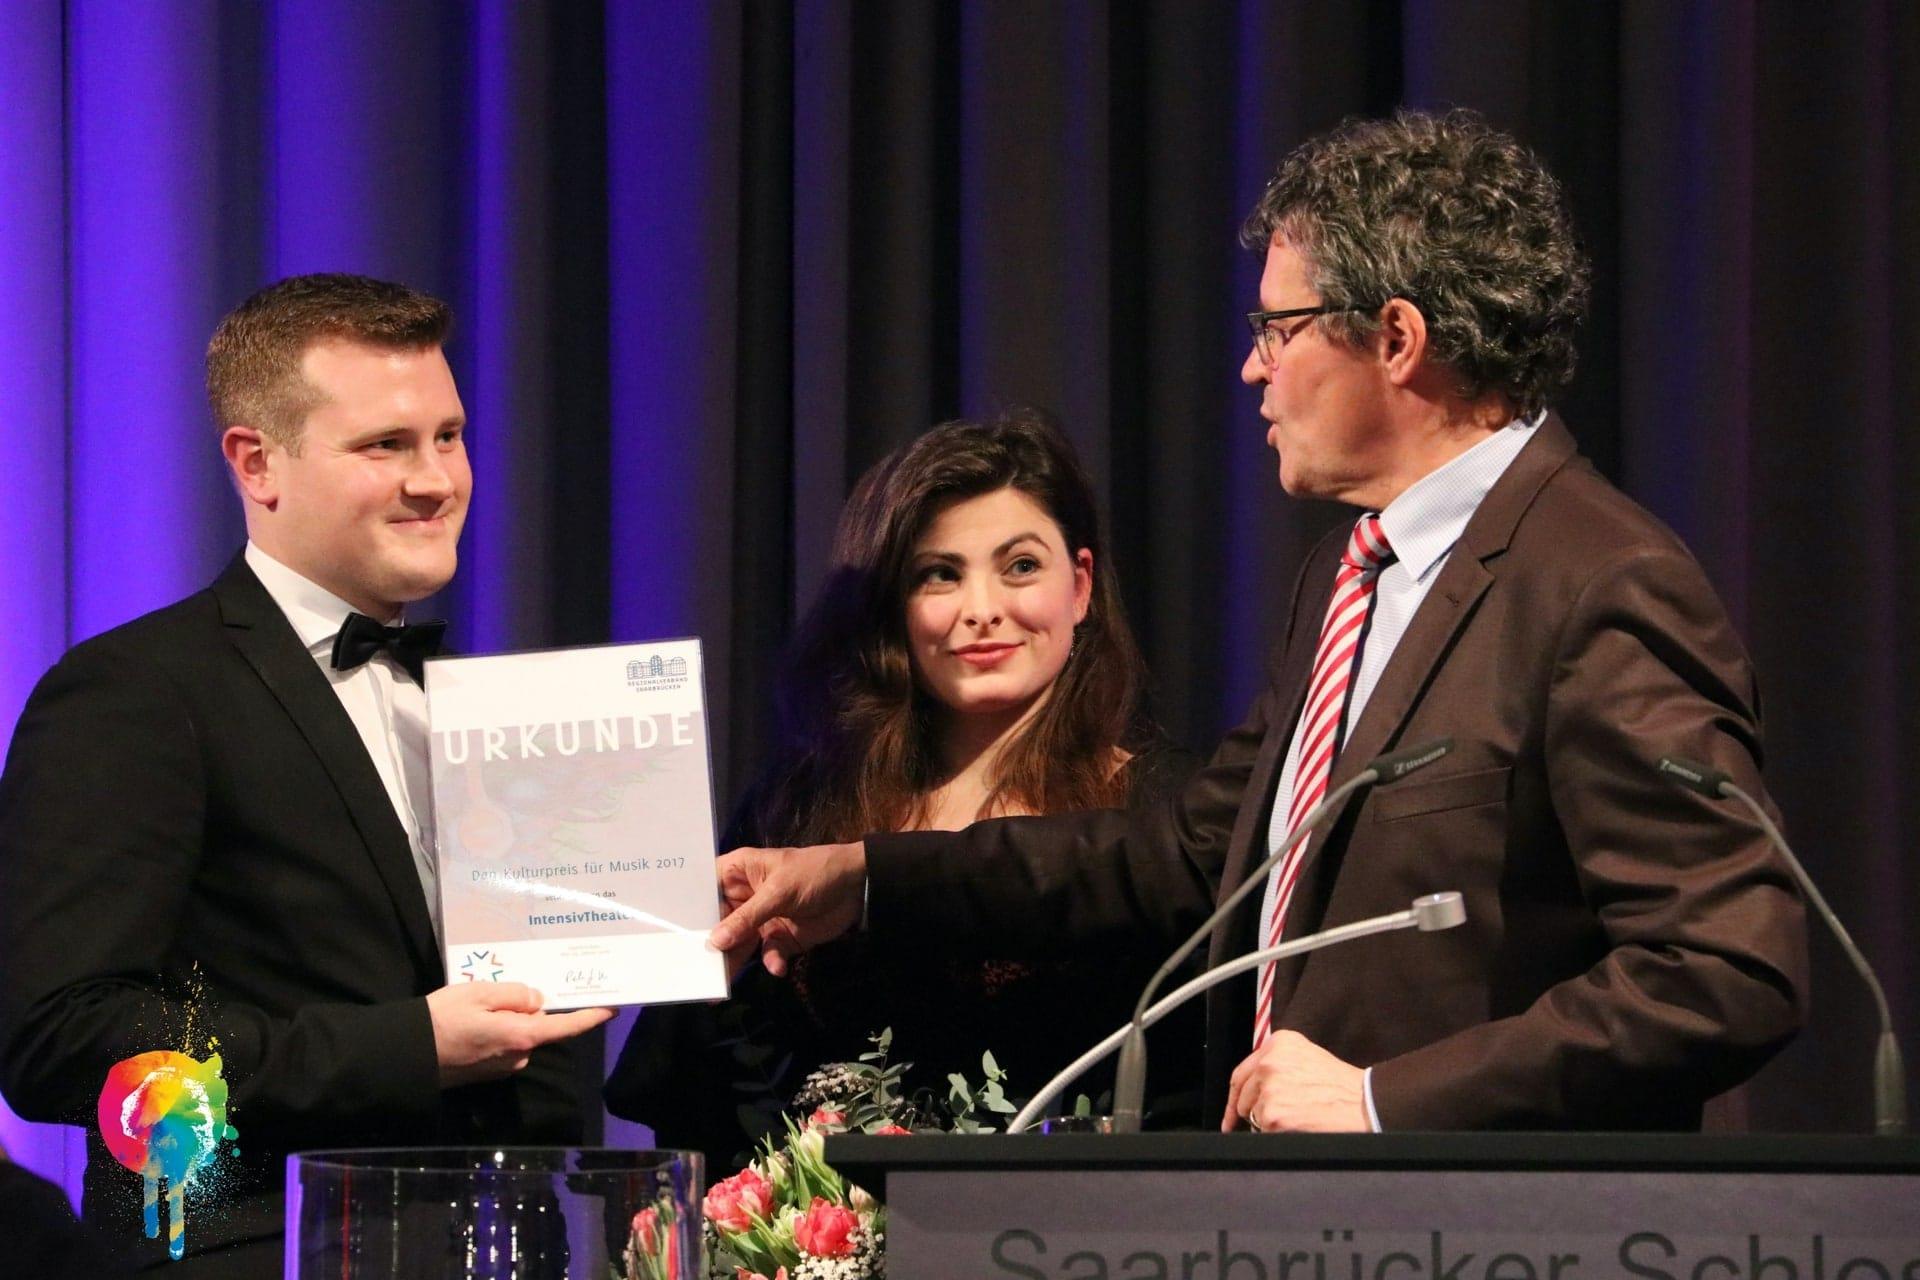 Verleihung des Kulturpreises für Musik 2017 im Saarbrücker Schloss am 24.01.2018